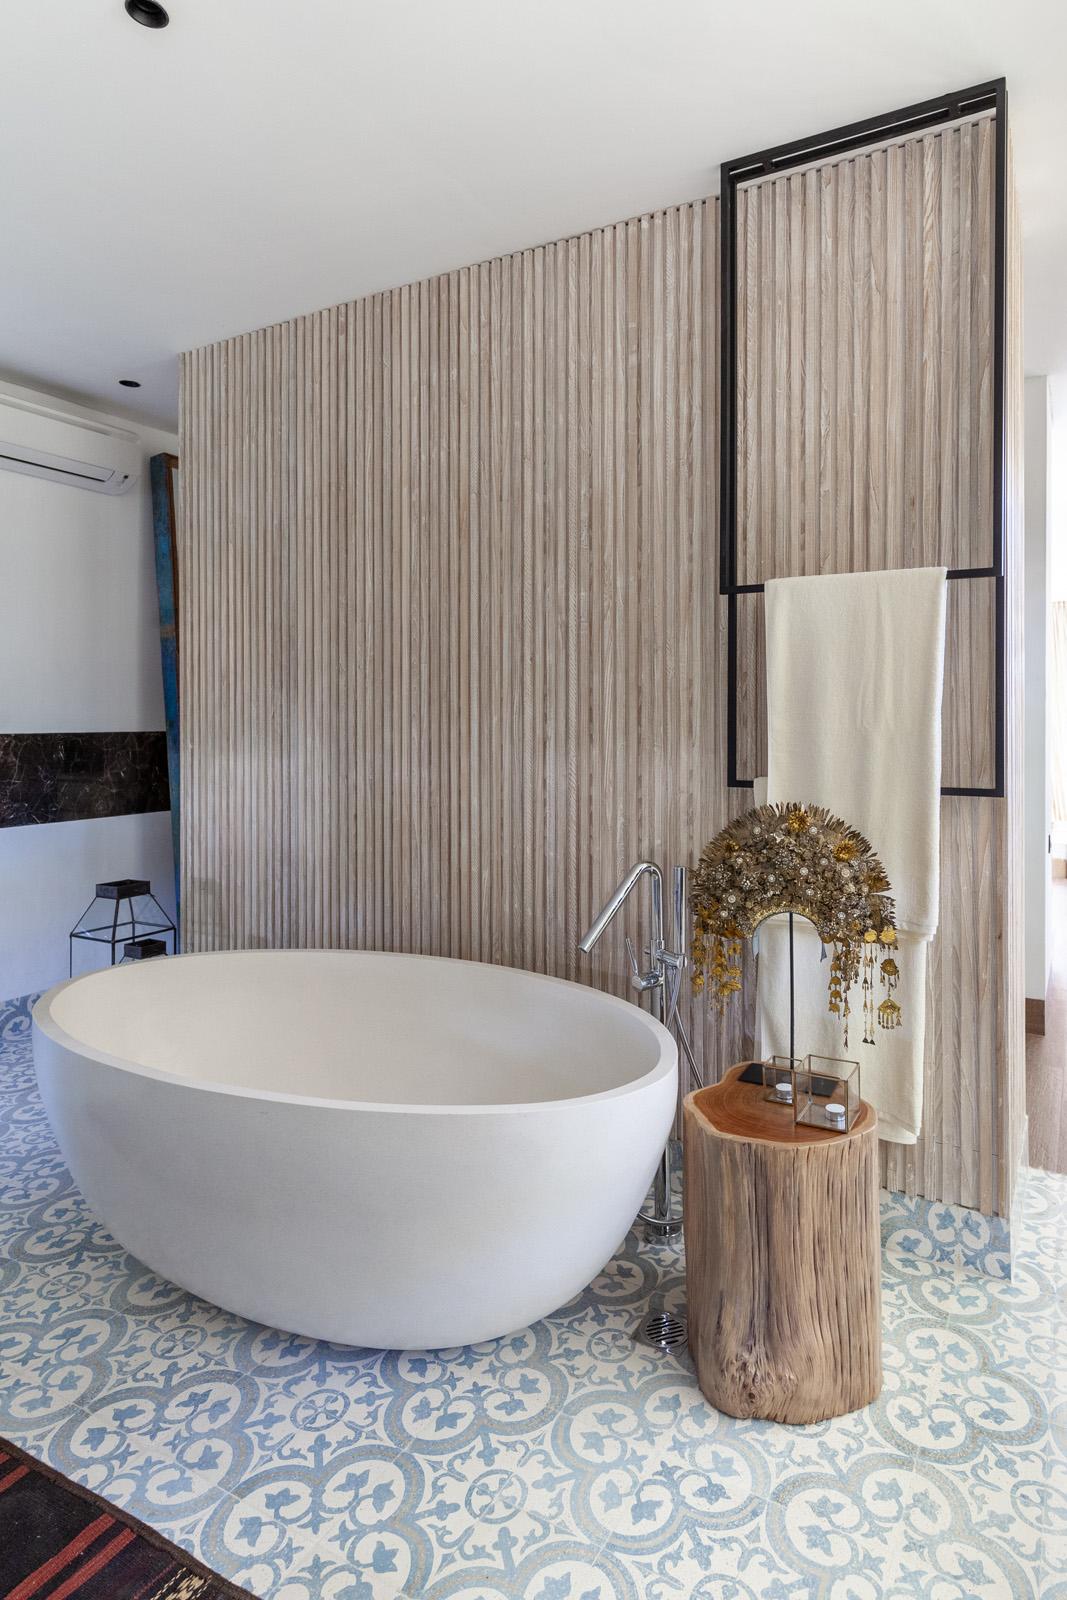 Villa Shahzadi, Sukyf Architects, Bali Interiors, master bedroom